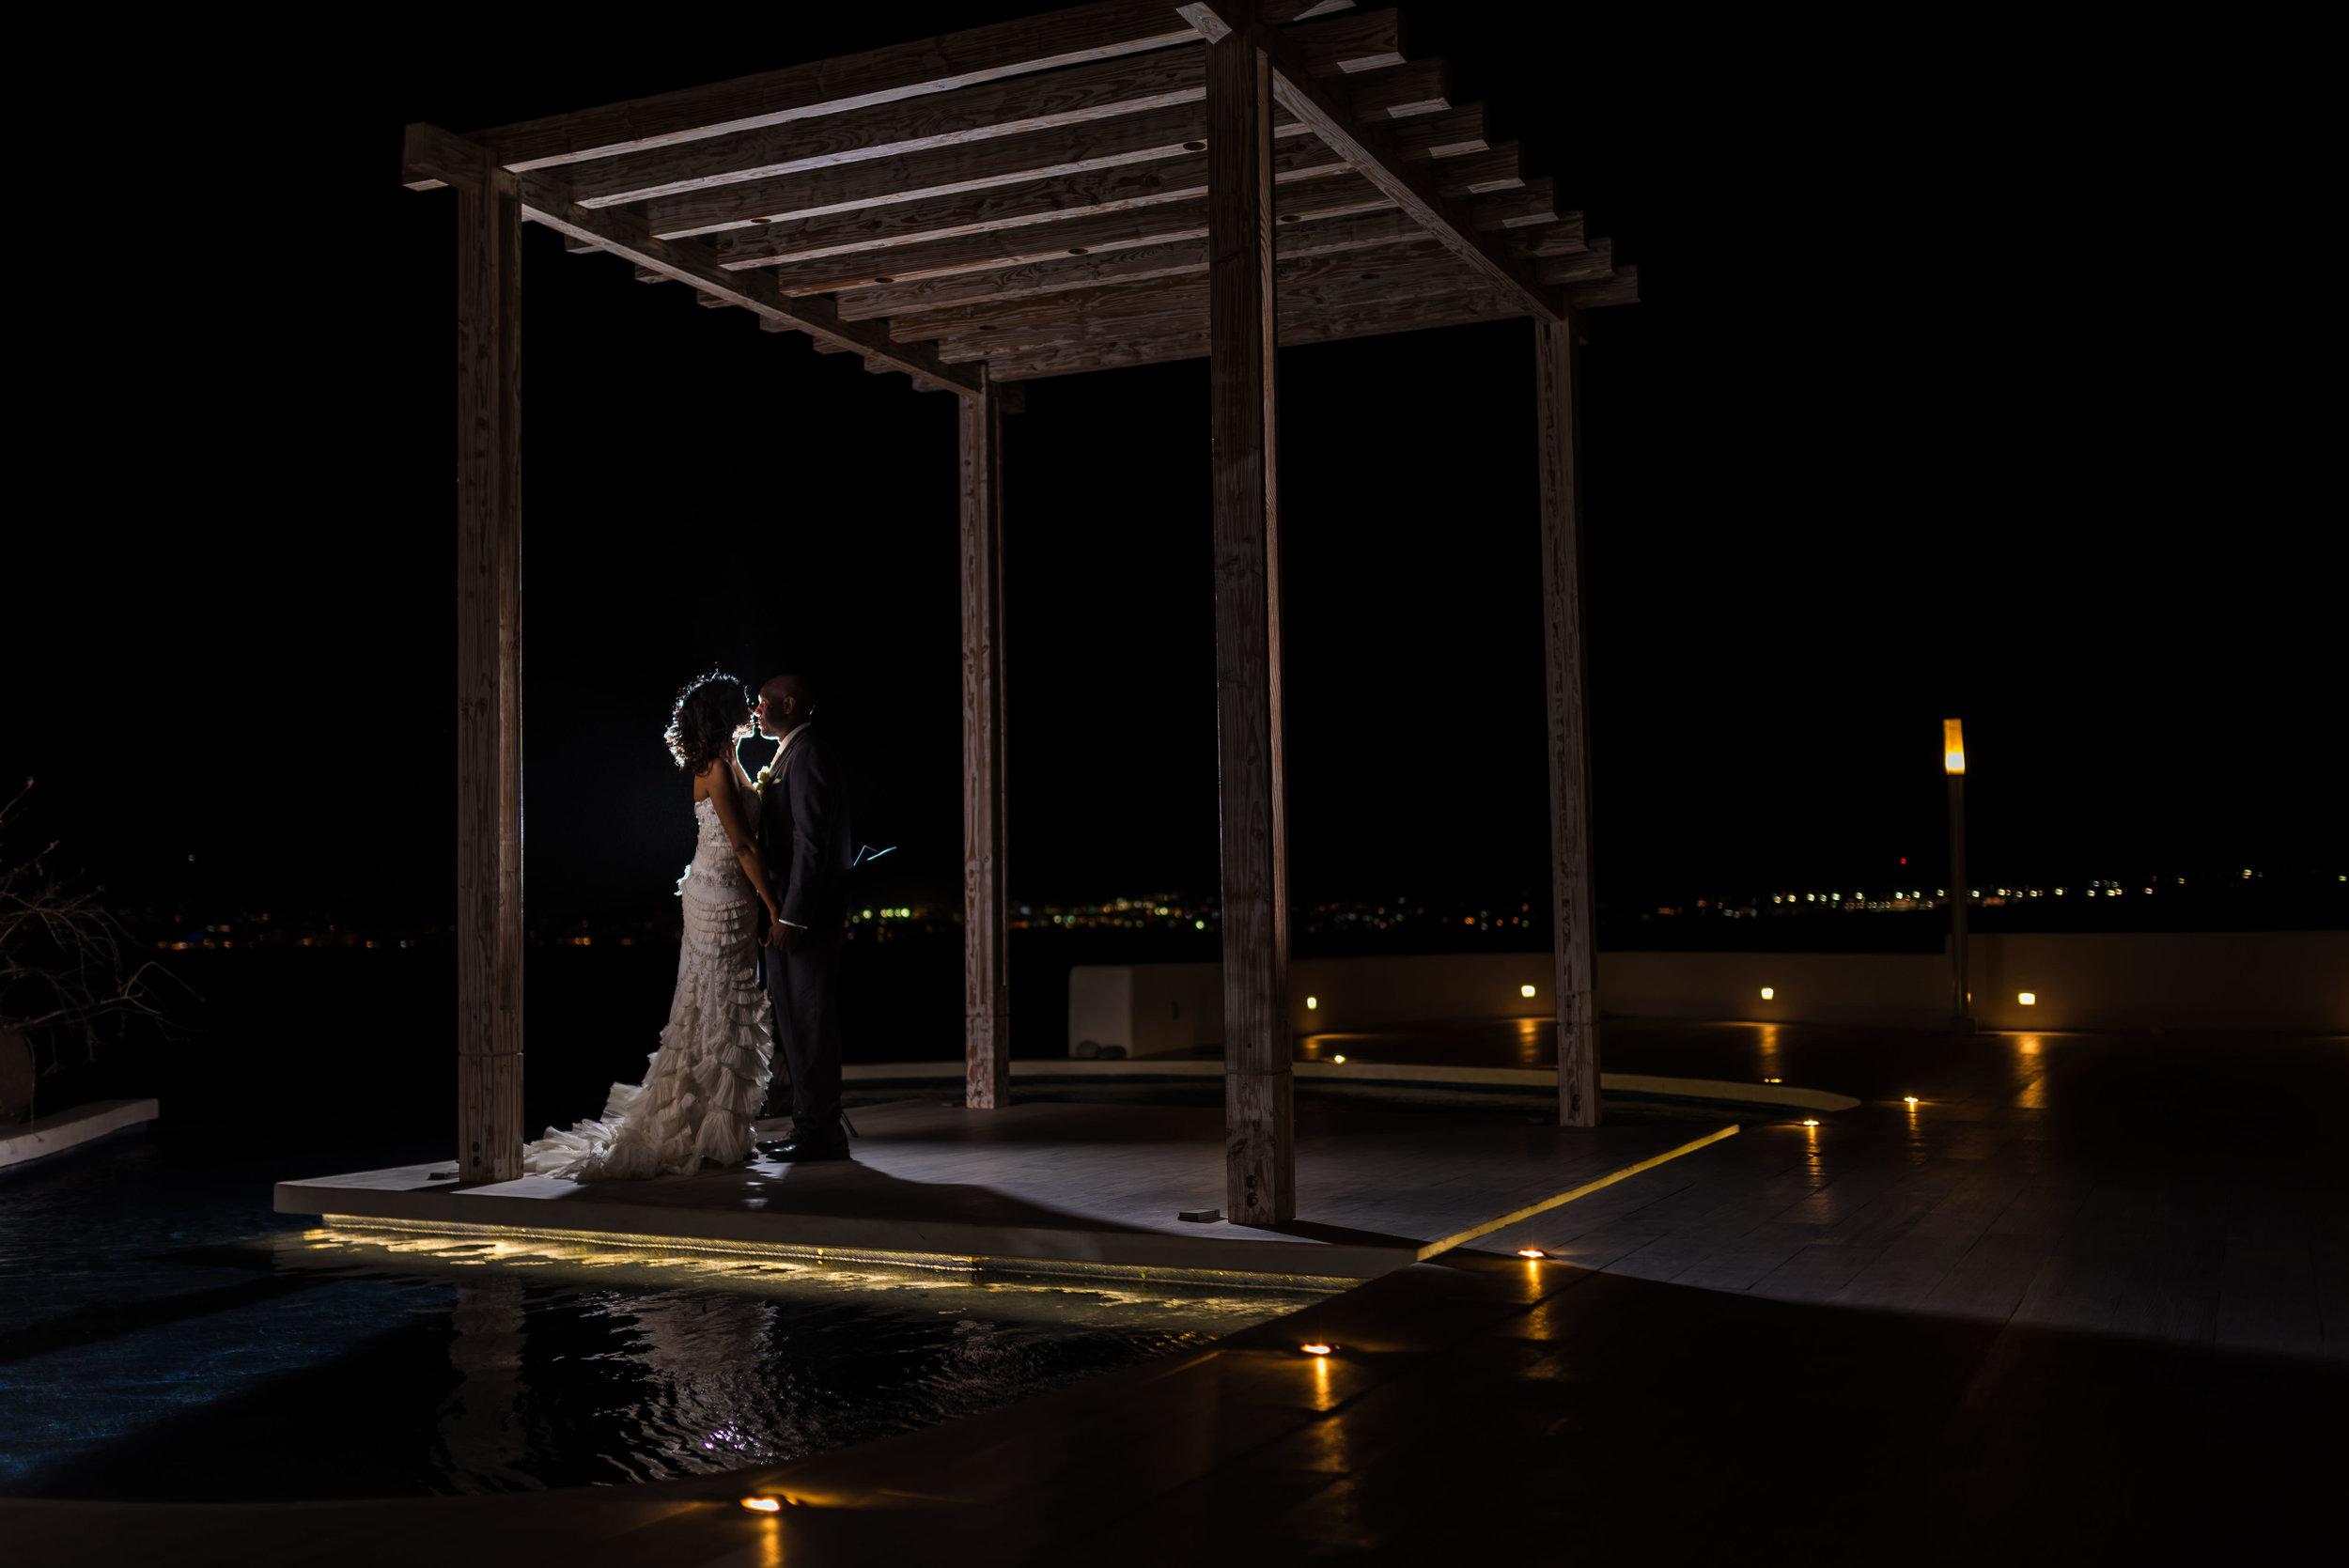 cabo-destination-weddingphotographer-43.JPG